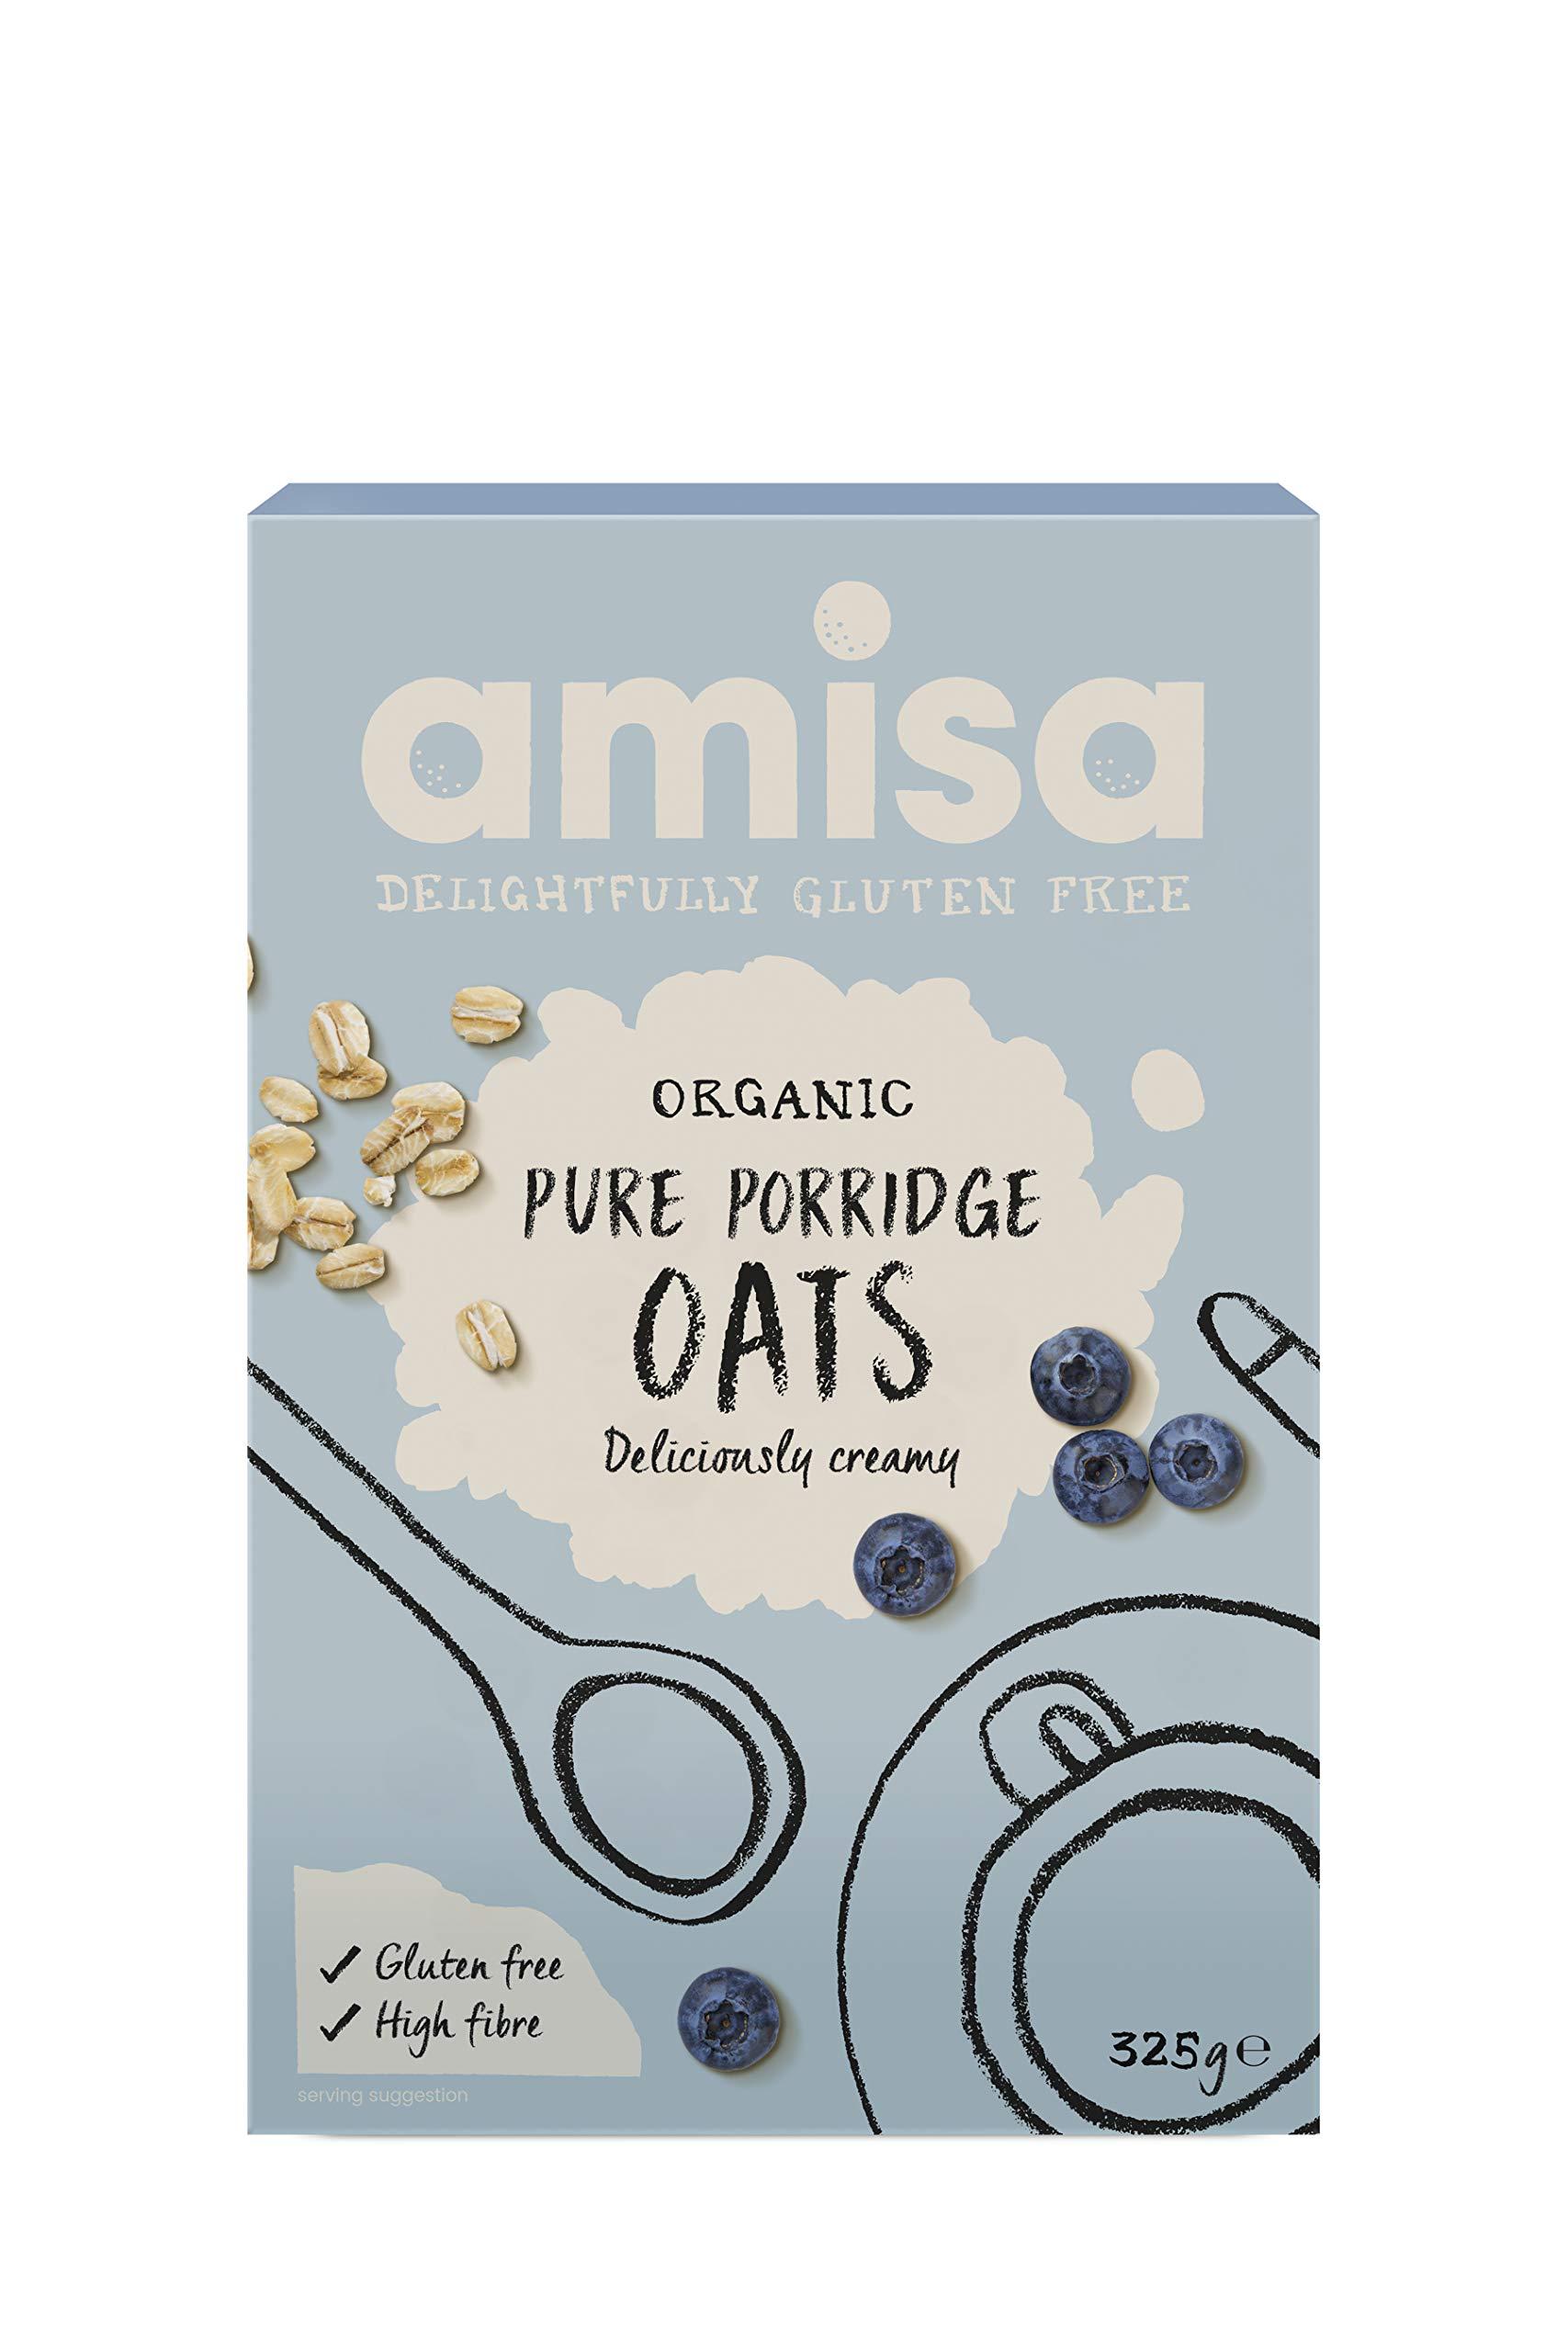 Amisa Organic Gluten Free Porridge Oats 325g (Pack of 6)